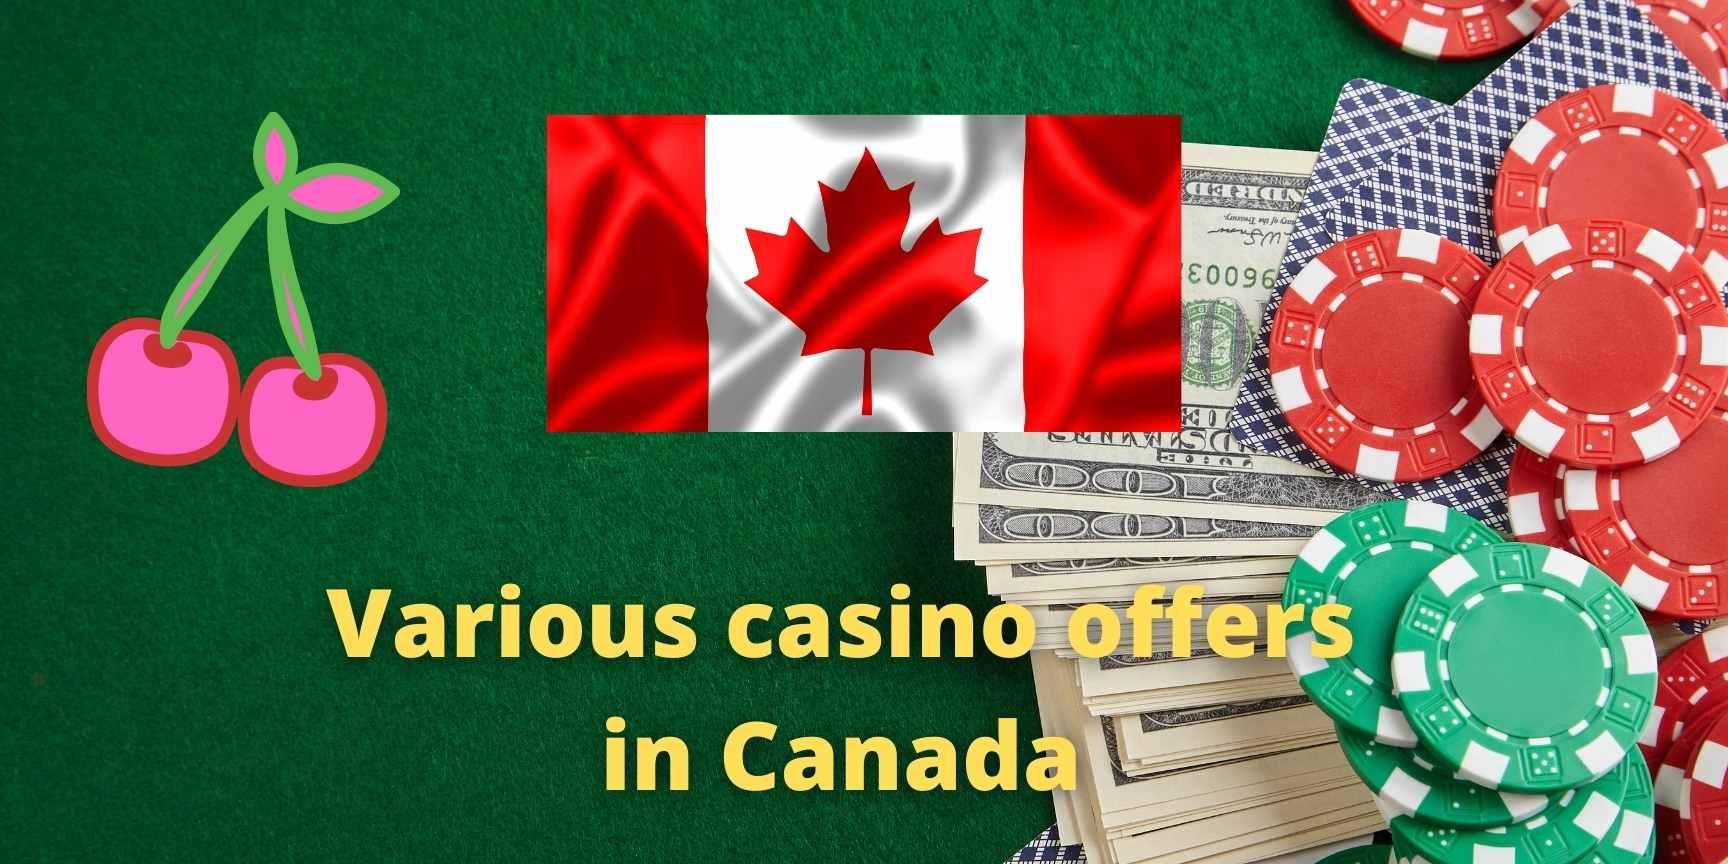 canada casino offers